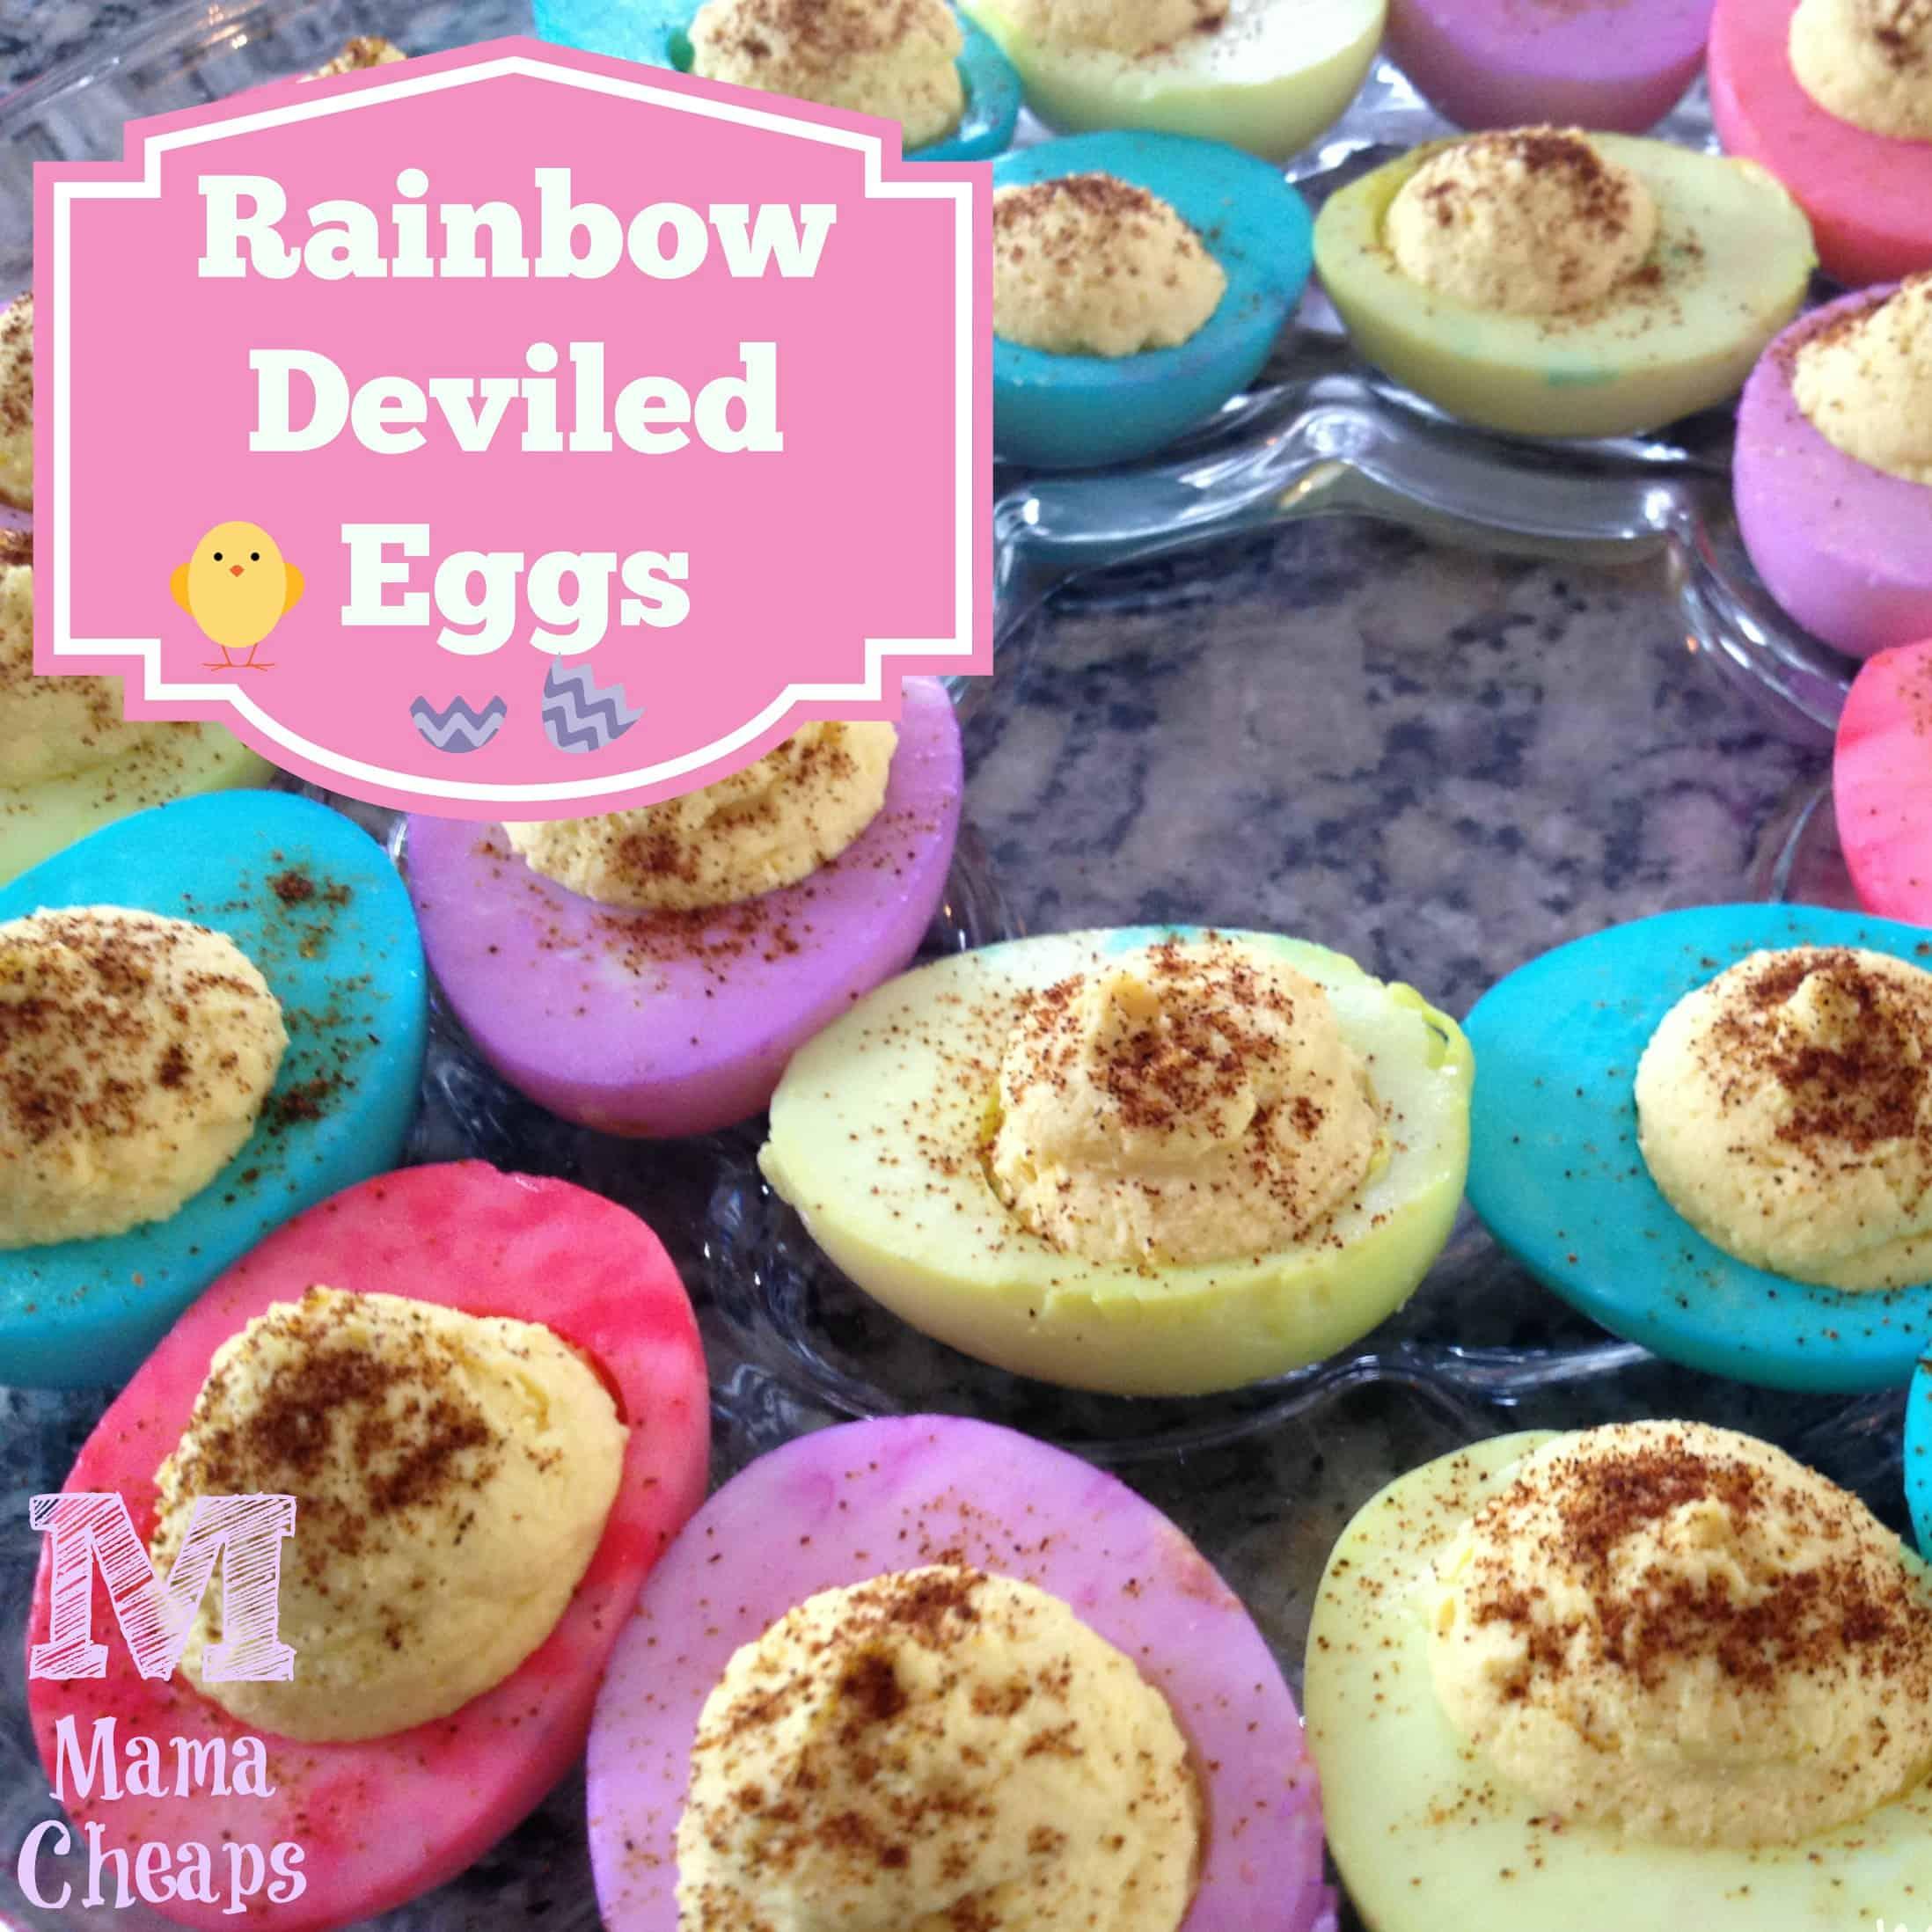 rainbow deviled eggs - title square